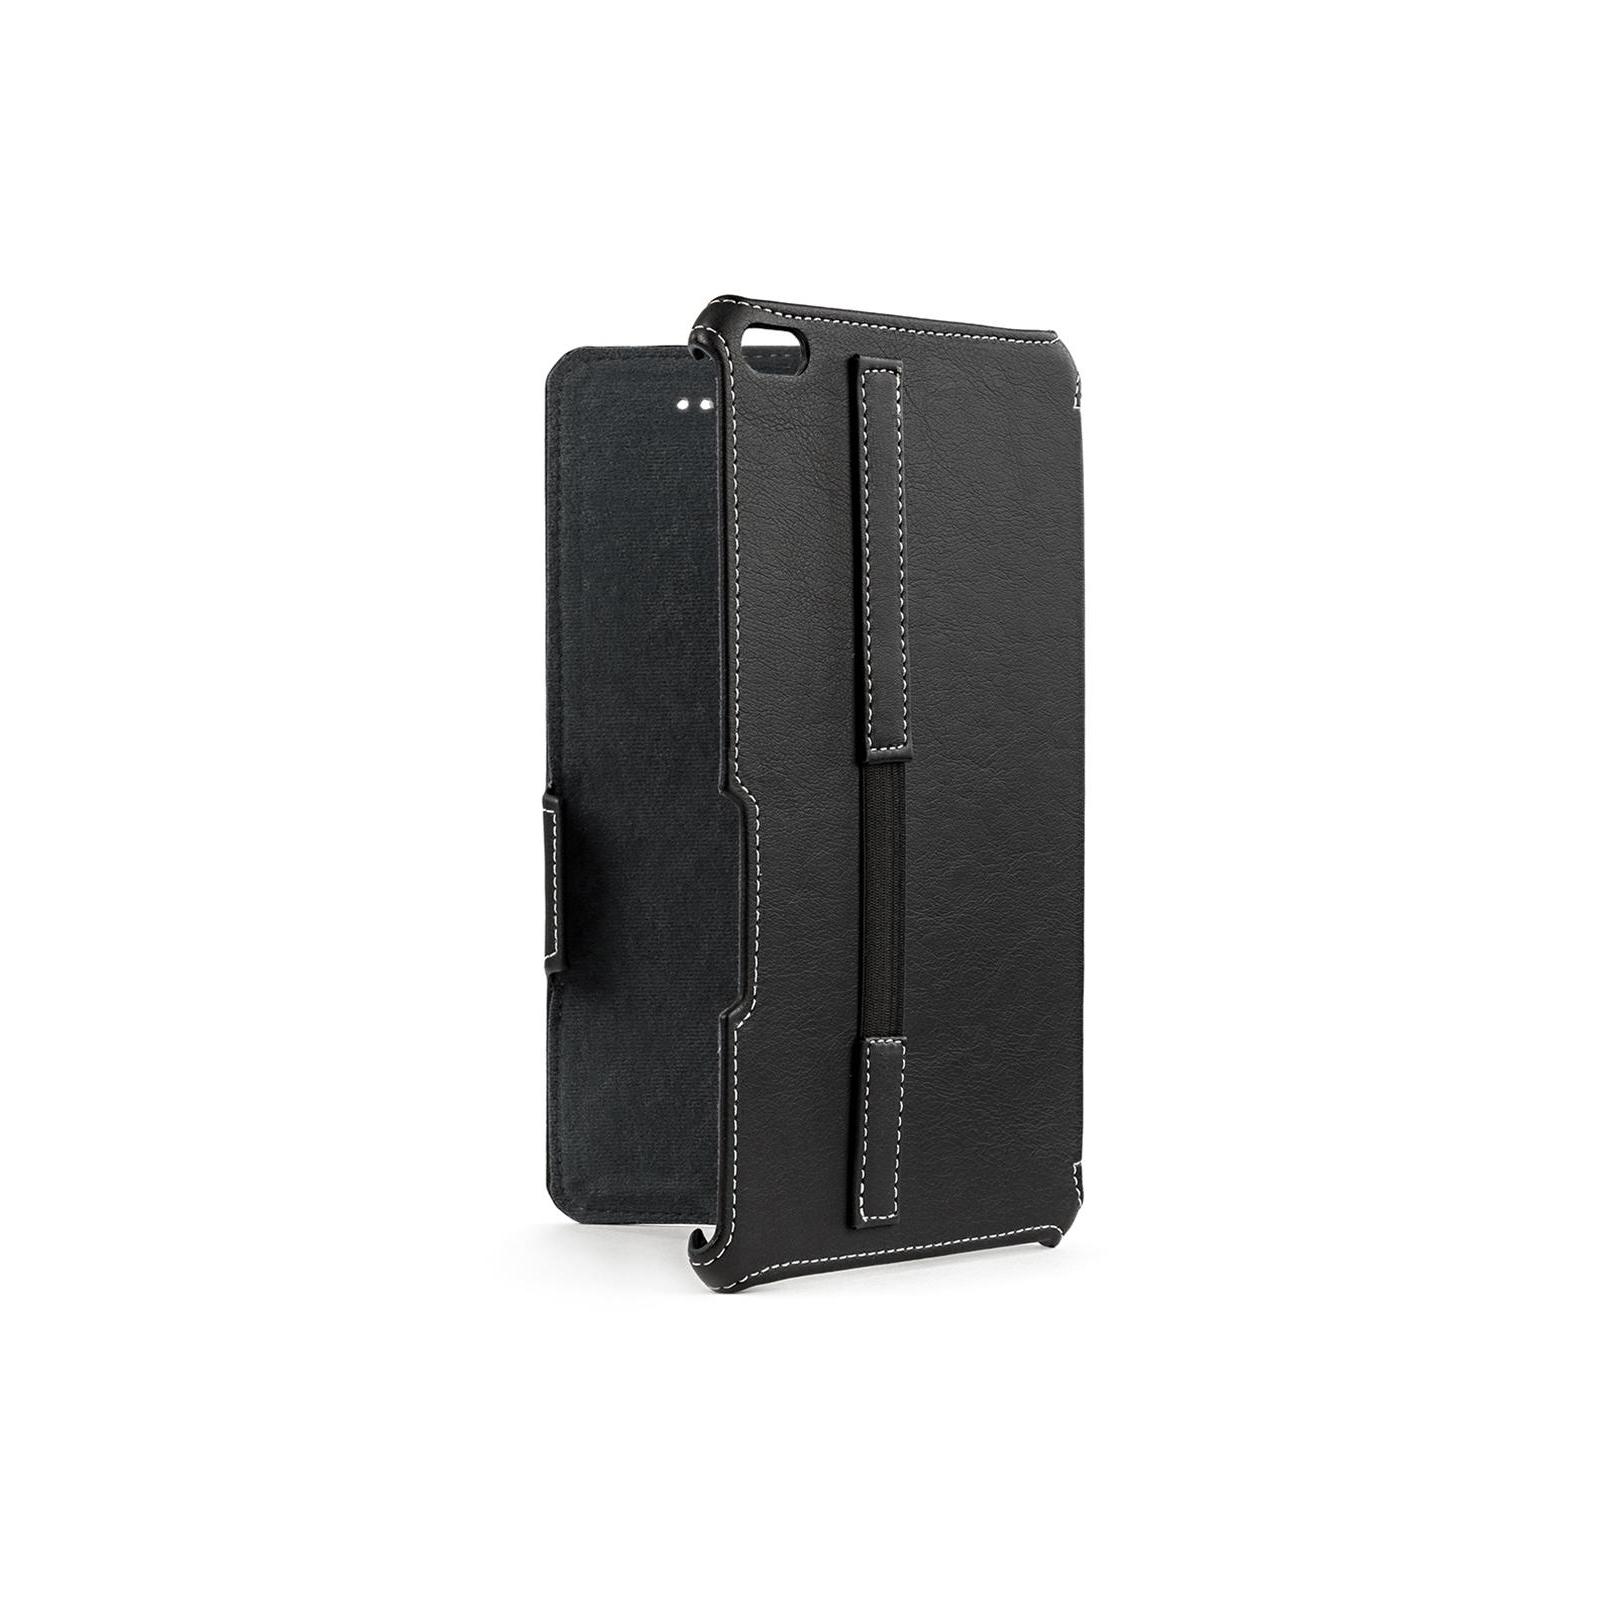 Чехол для планшета Lenovo Tab 4 7 TB-7304I black Vinga (VNTB7304I) изображение 2